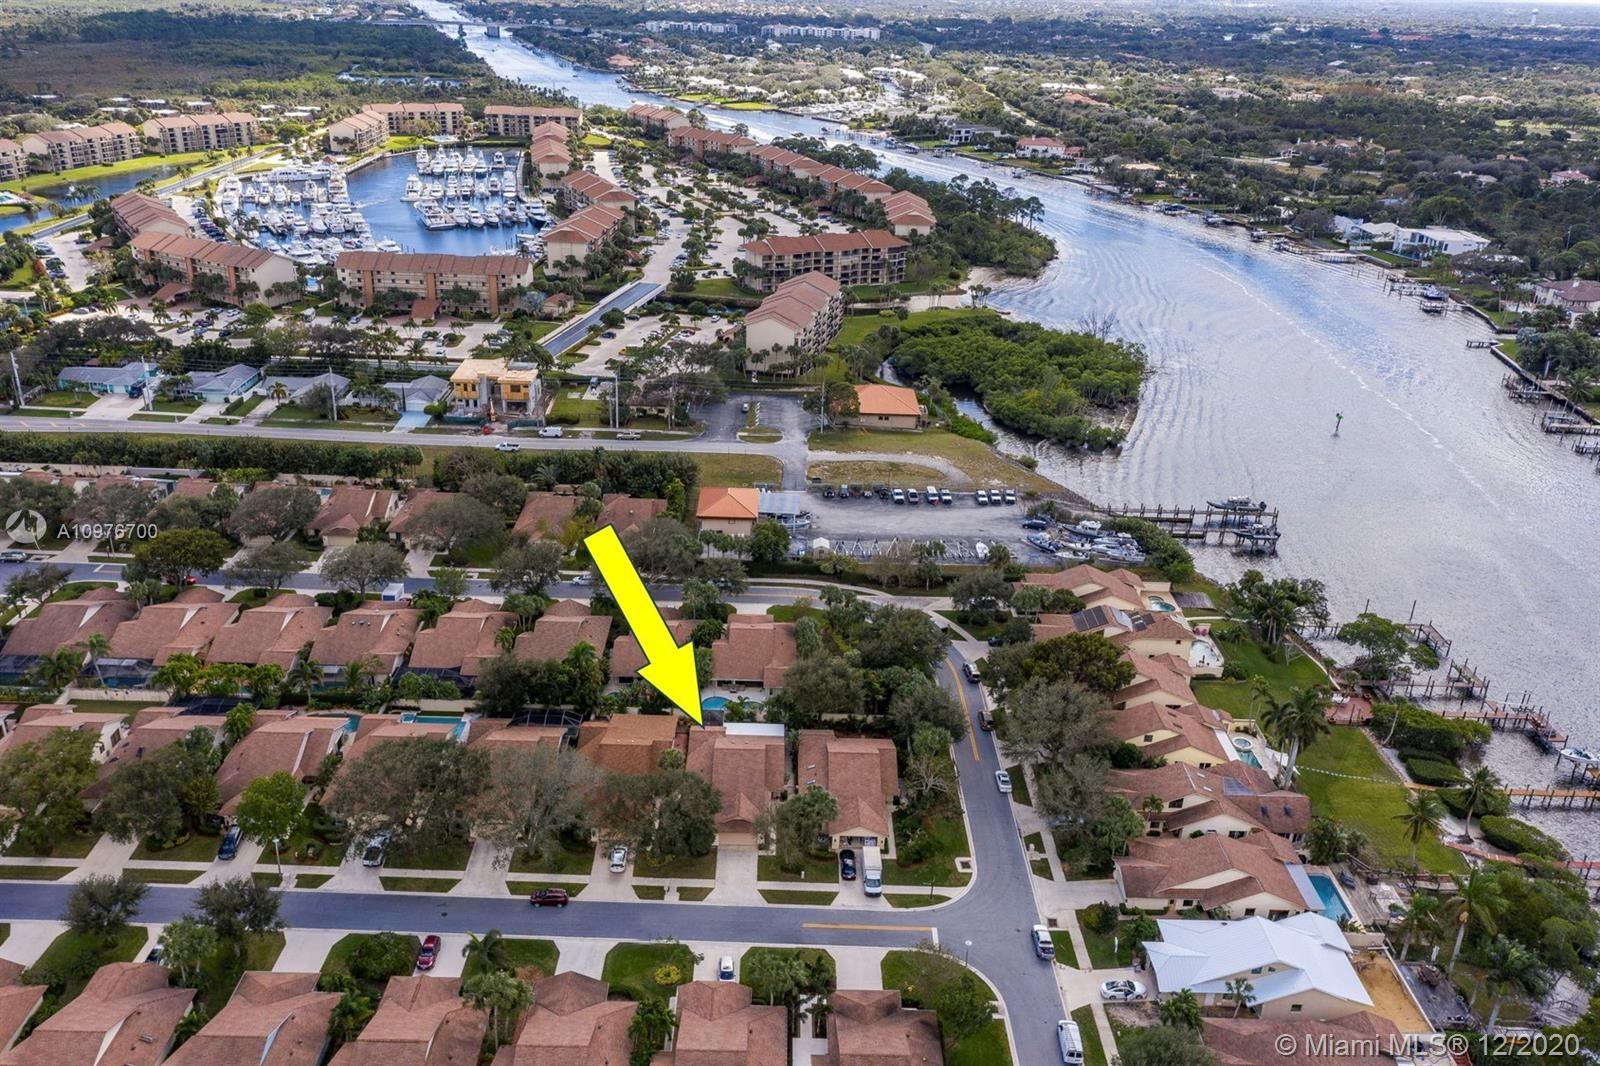 Photo of 116 Inner Harbour Way, Jupiter, FL 33477 (MLS # A10976700)